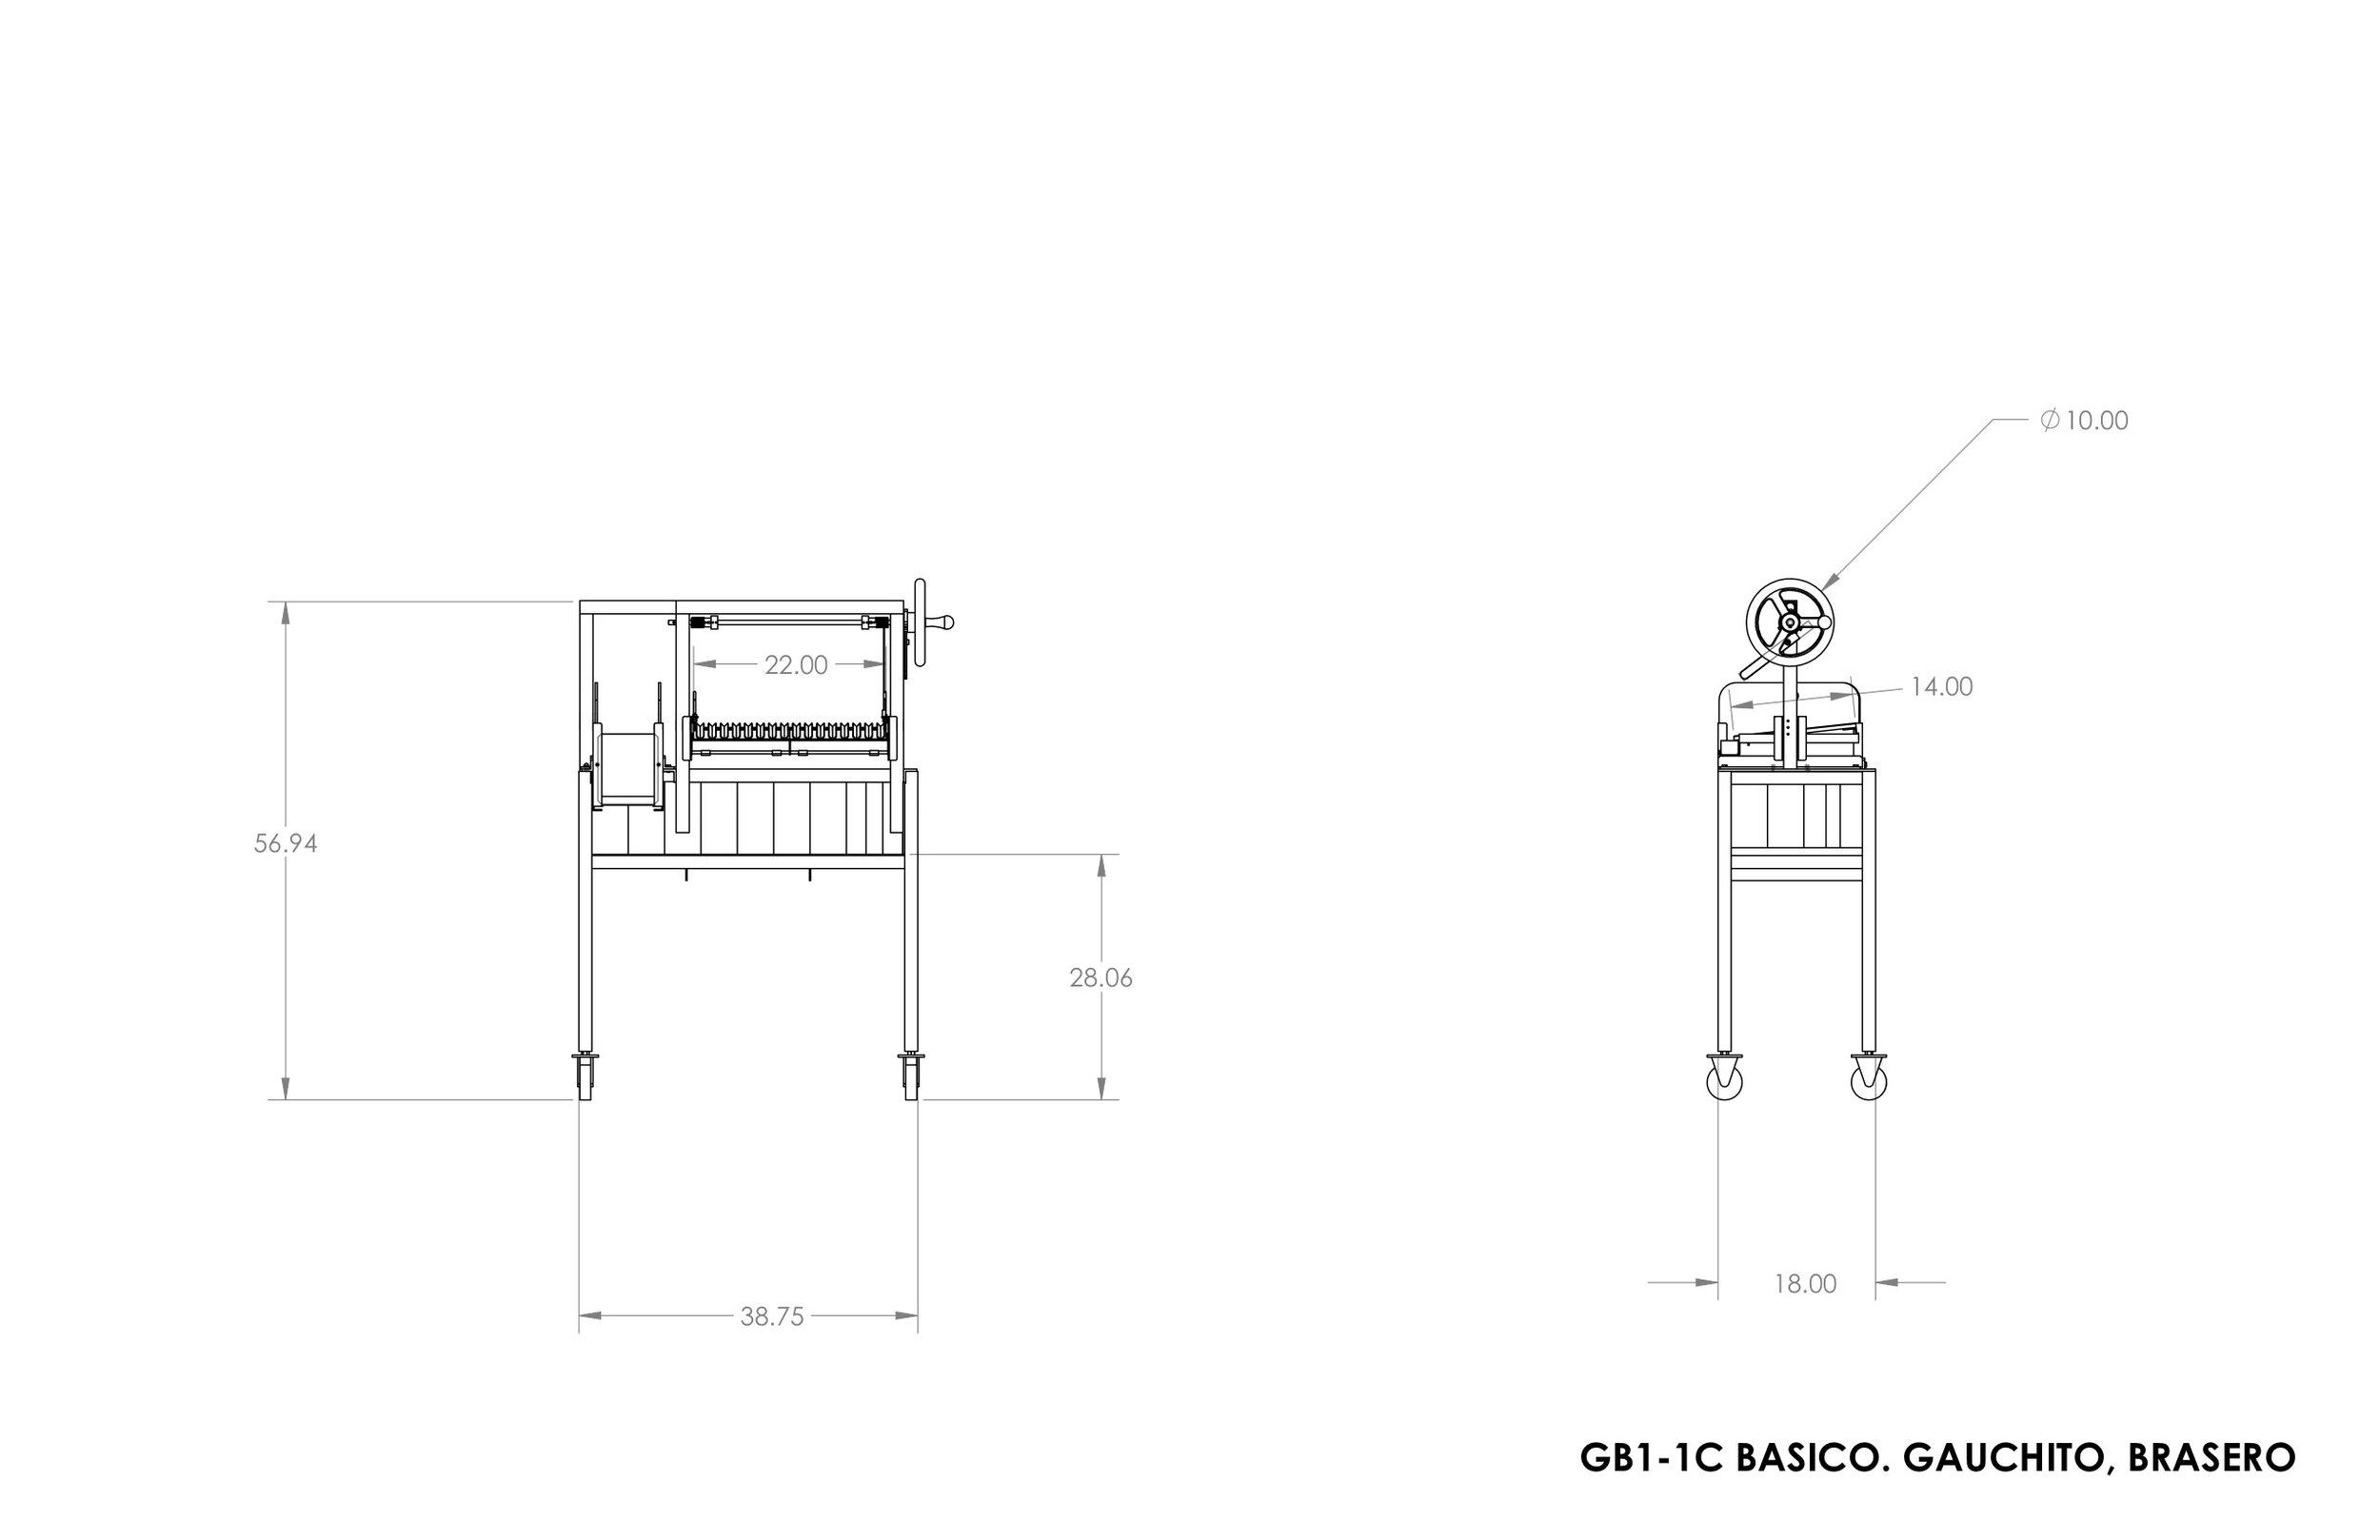 GB1-1C BASICO, GAUCHITO, BRASERO.jpg